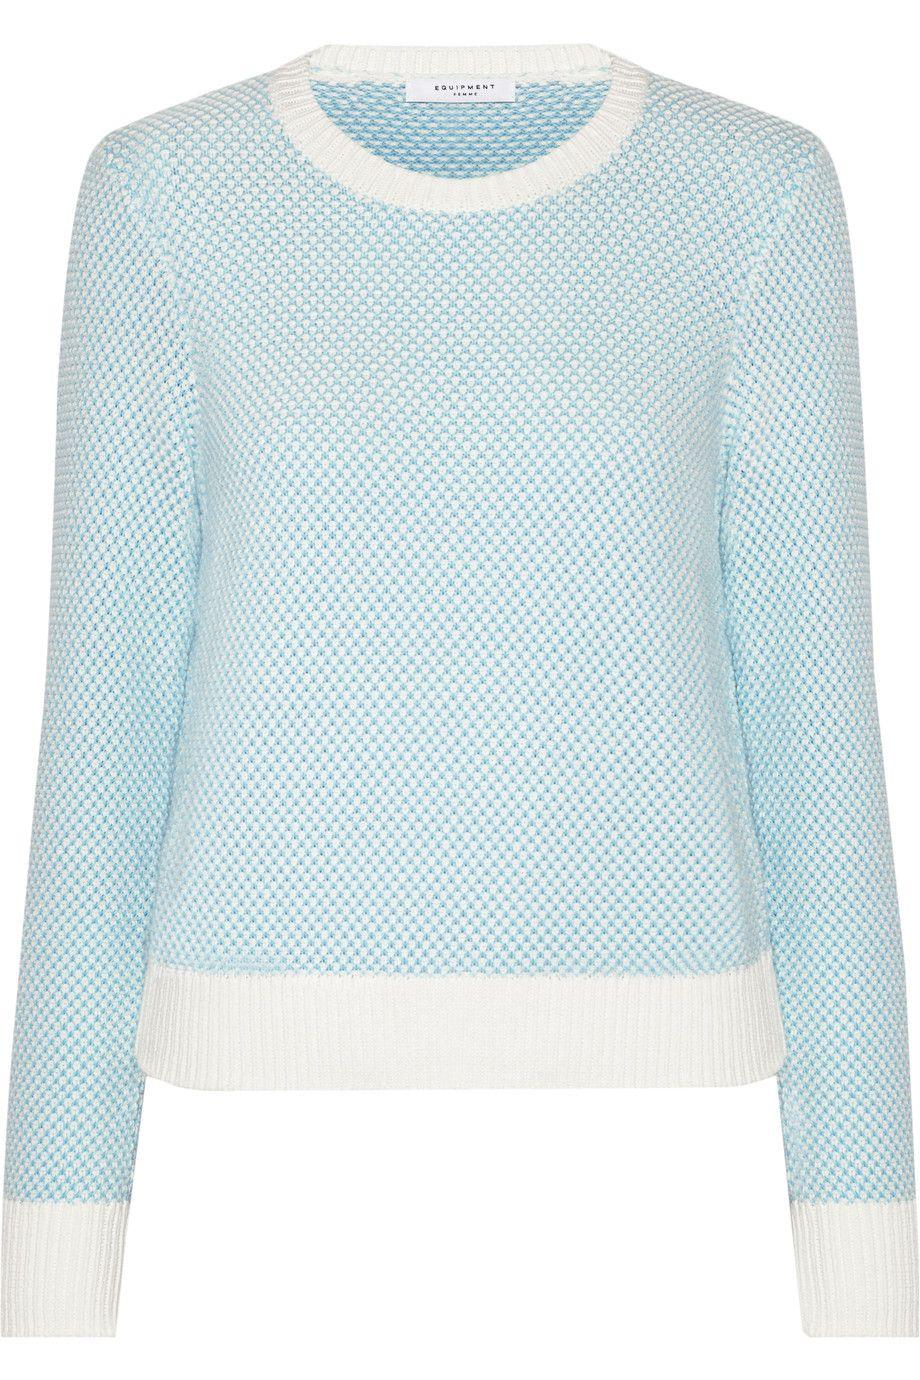 EQUIPMENT Shirley Cotton-Blend Sweater. #equipment #cloth #sweater